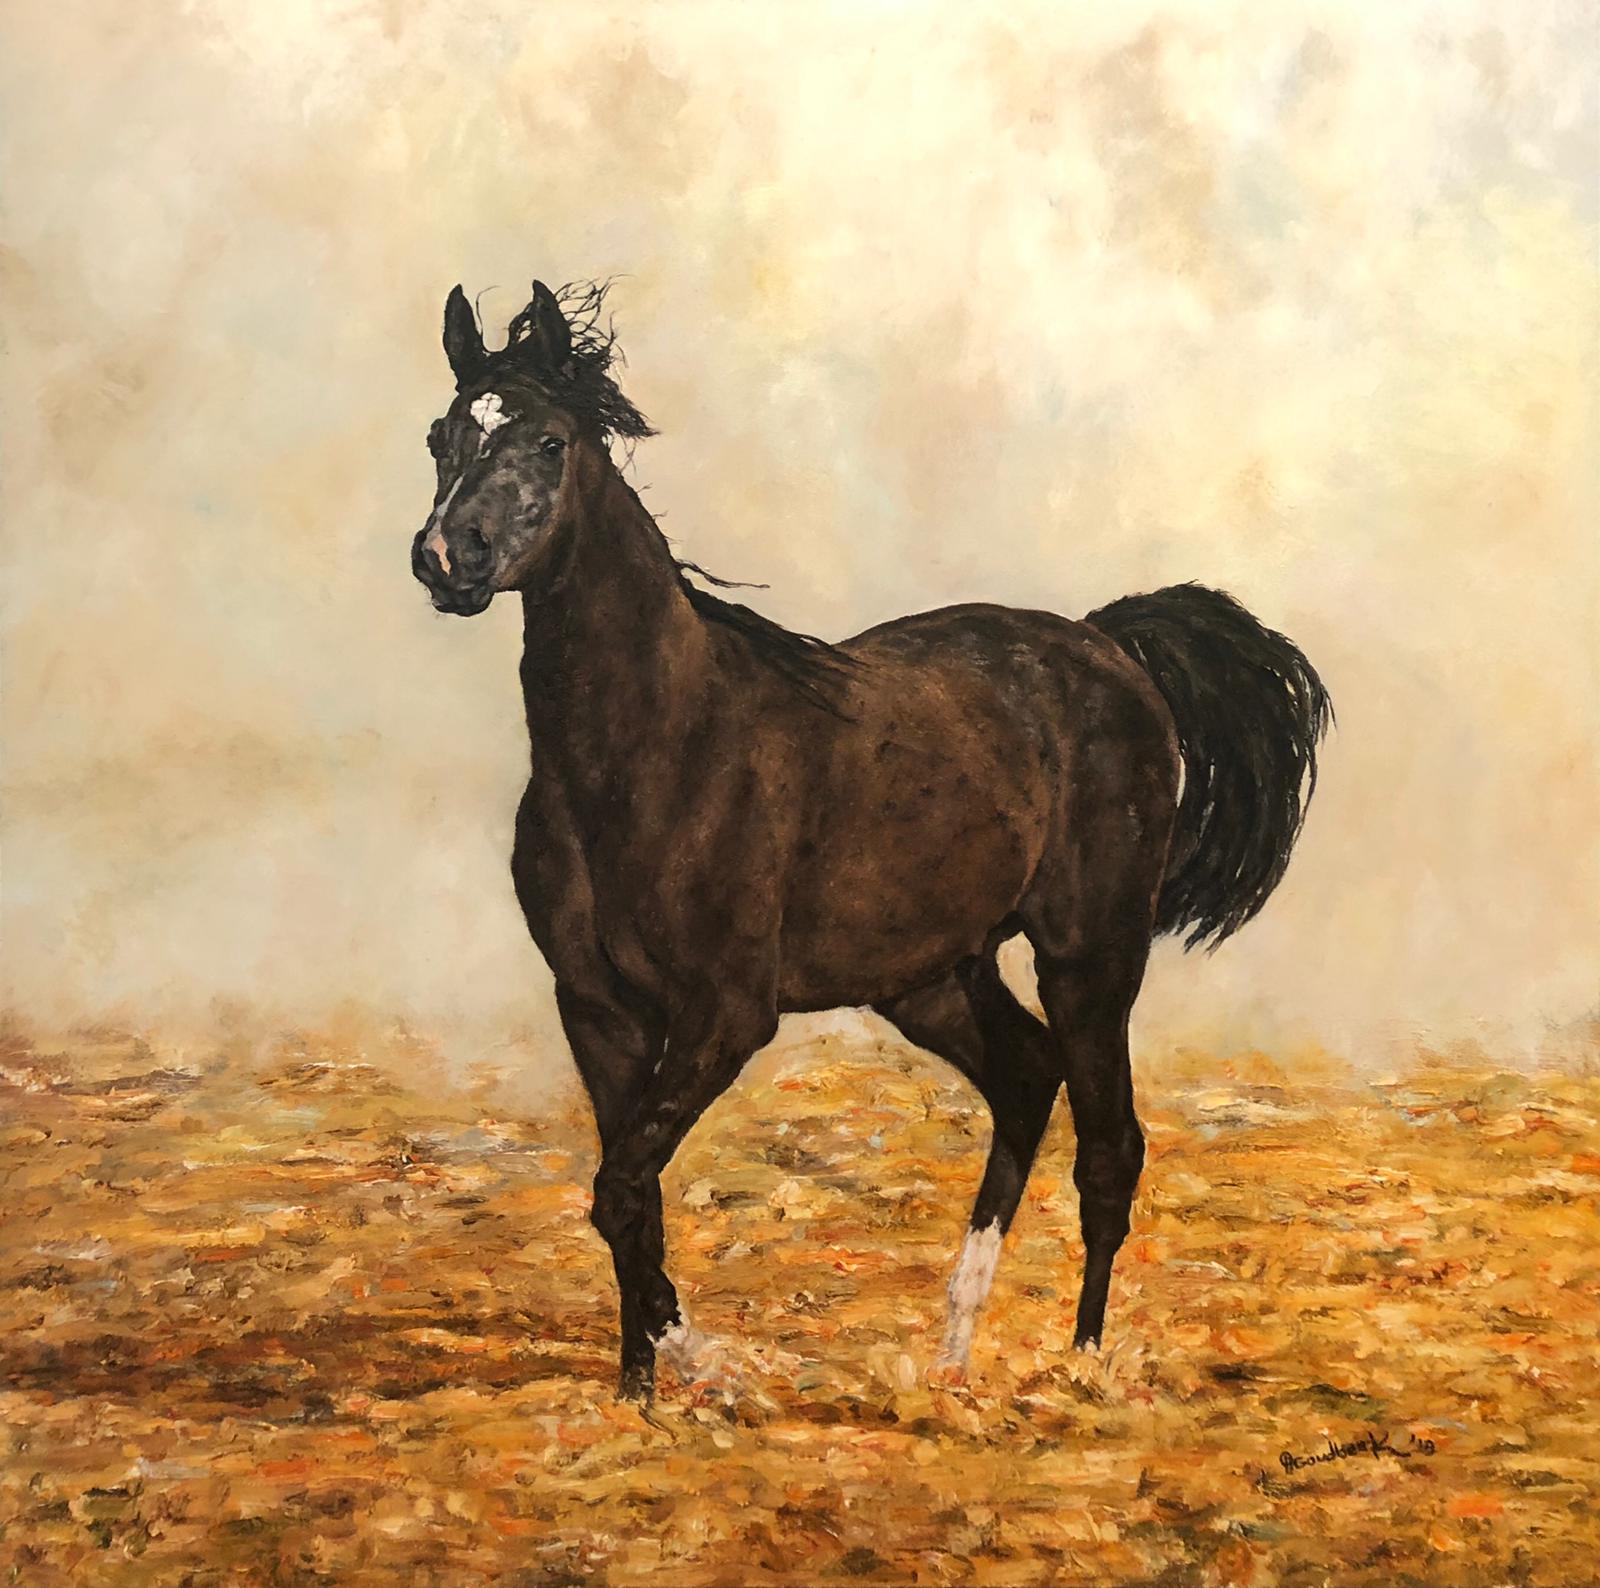 'Pure-bred Bahraini Arabian Horse' The Royal Arabian studs facility, Al Jazayer